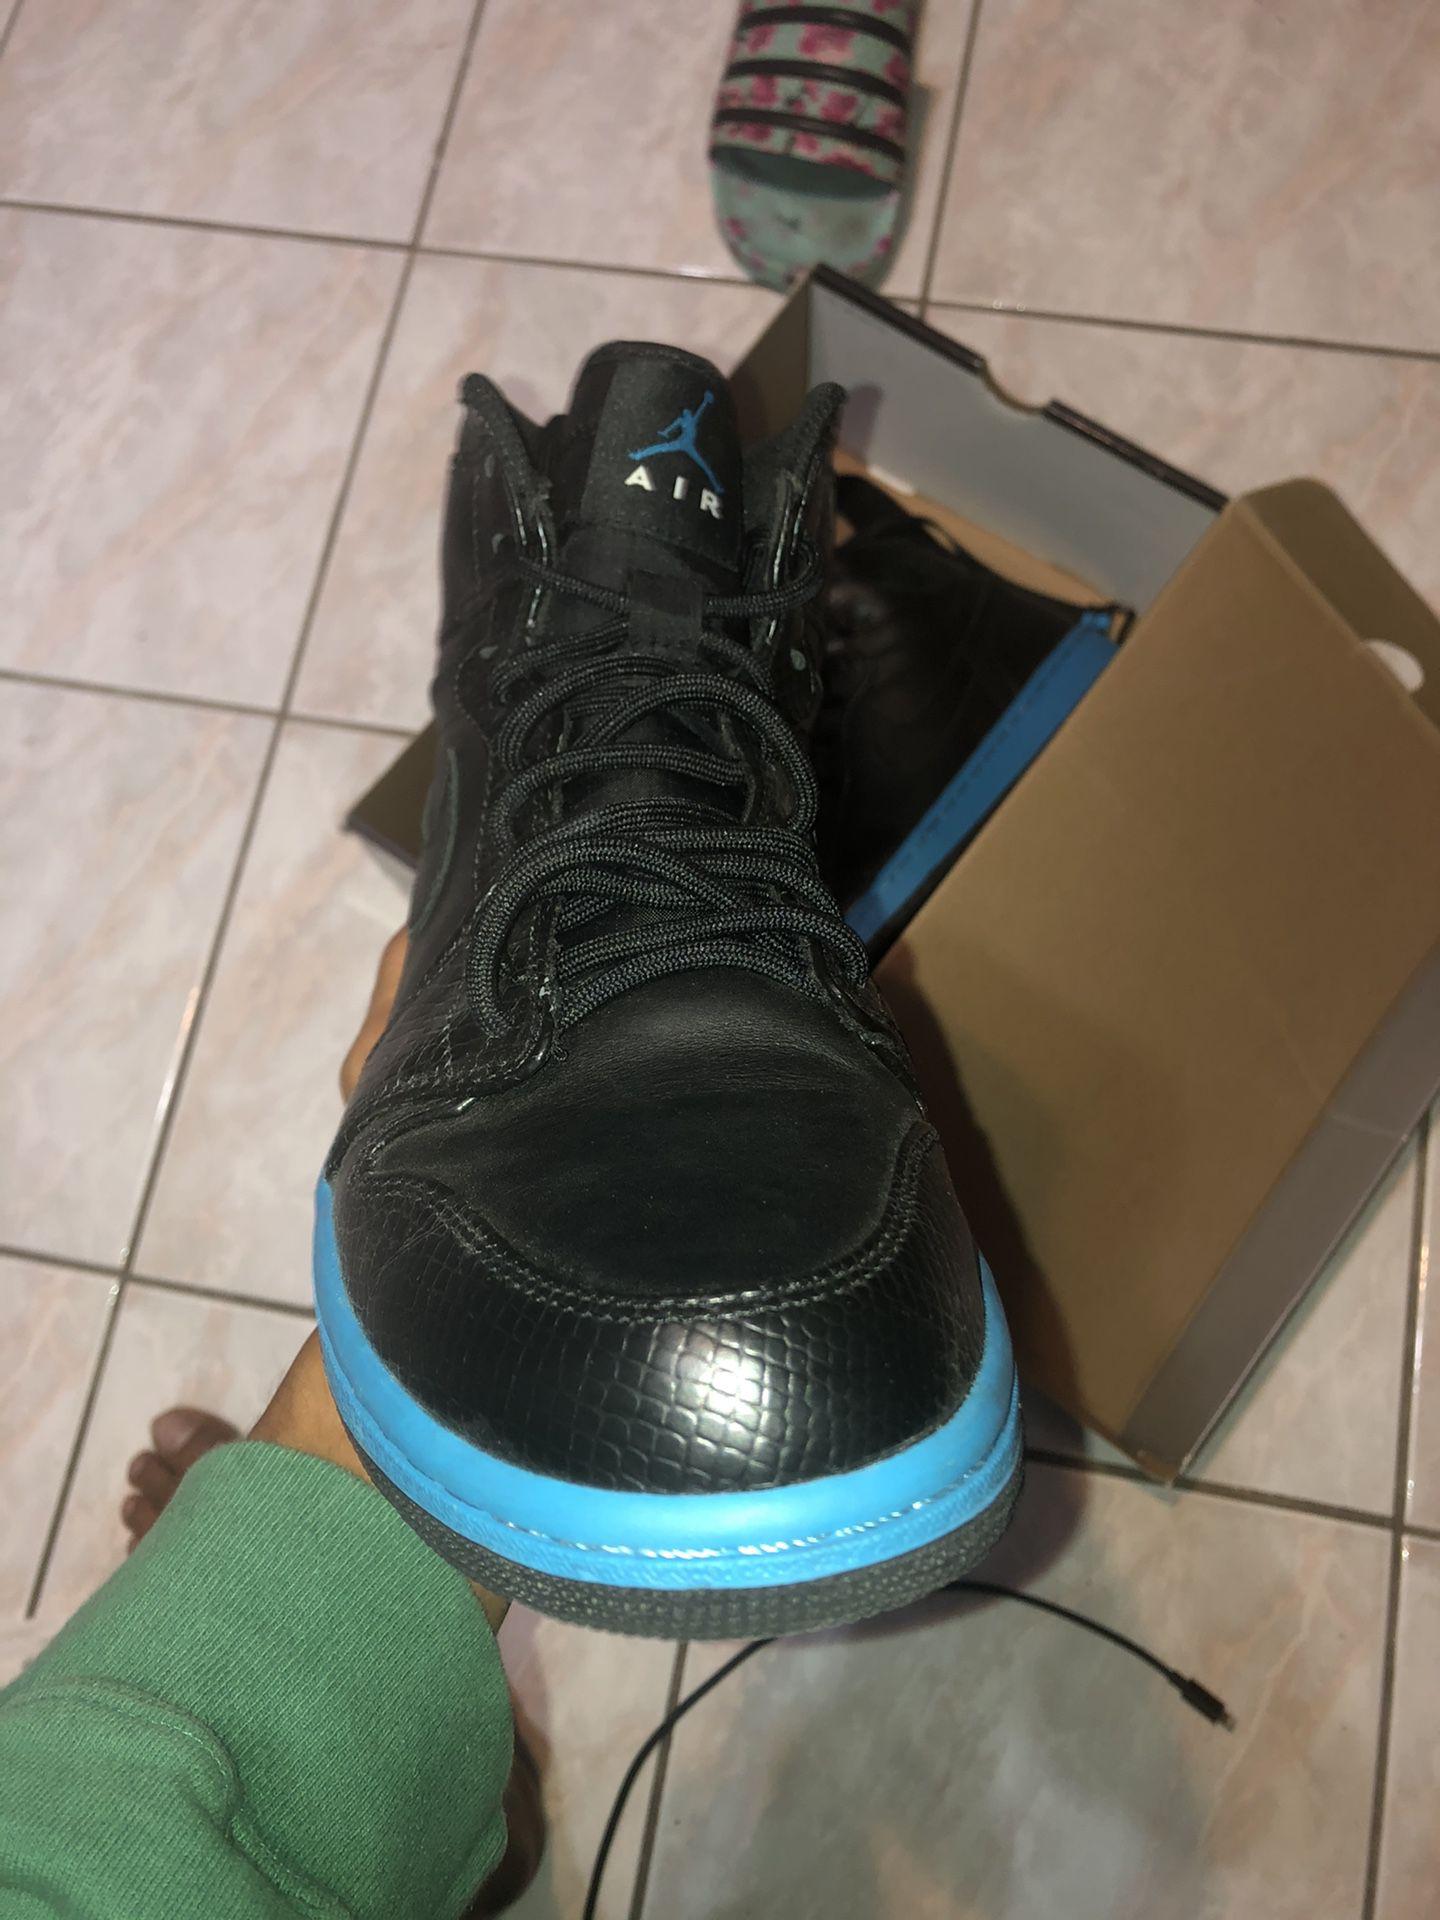 Air Jordan 1 Size 9 Black and blue